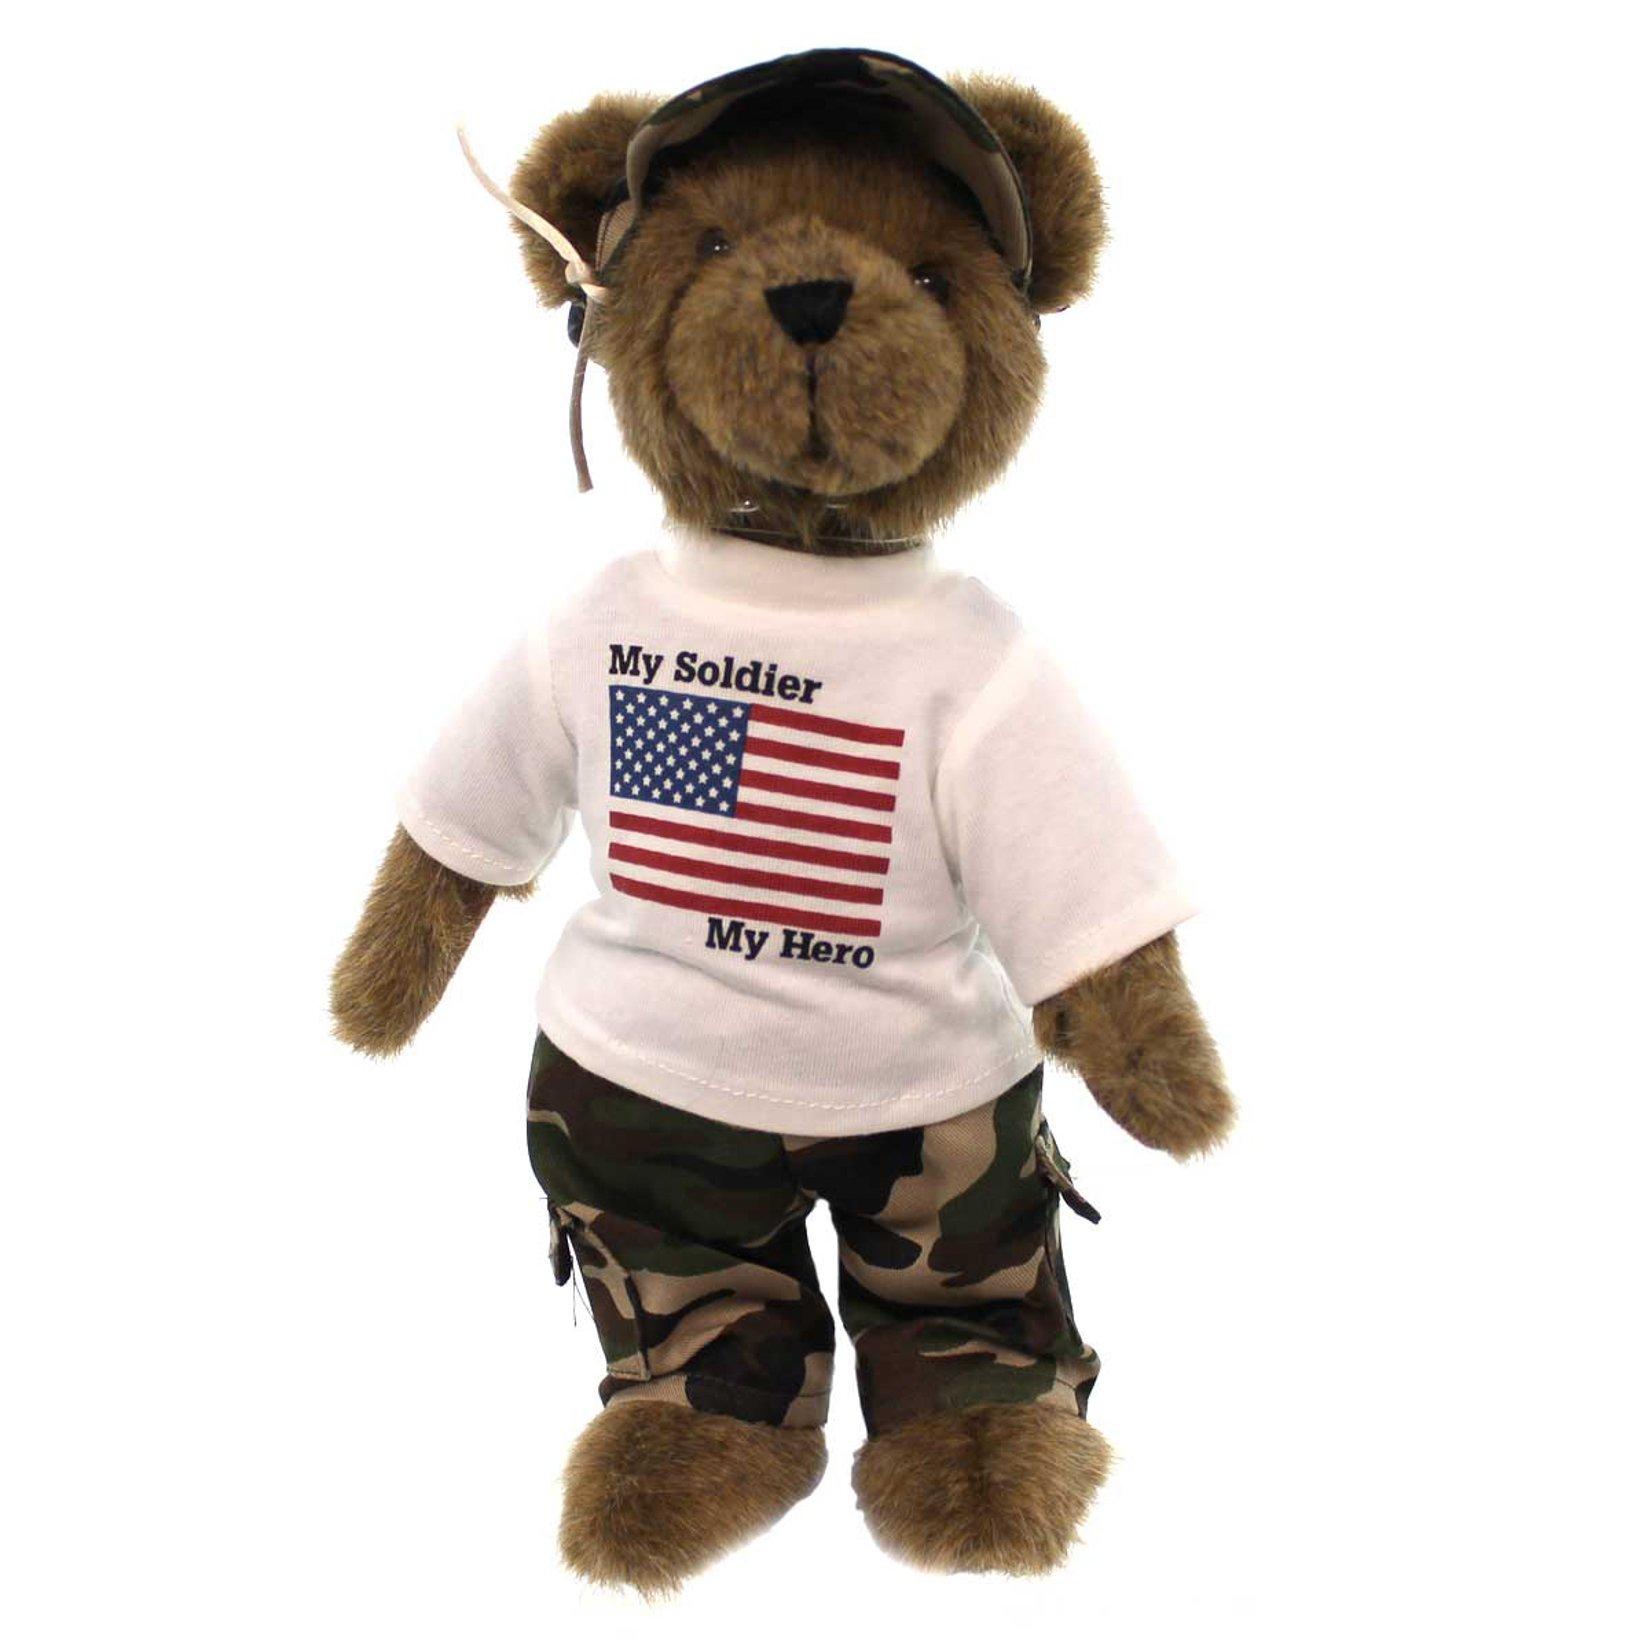 Boyds Bears - Bears Like You Lifestyle Plush - Teddy Patriot Military Bear - 12''